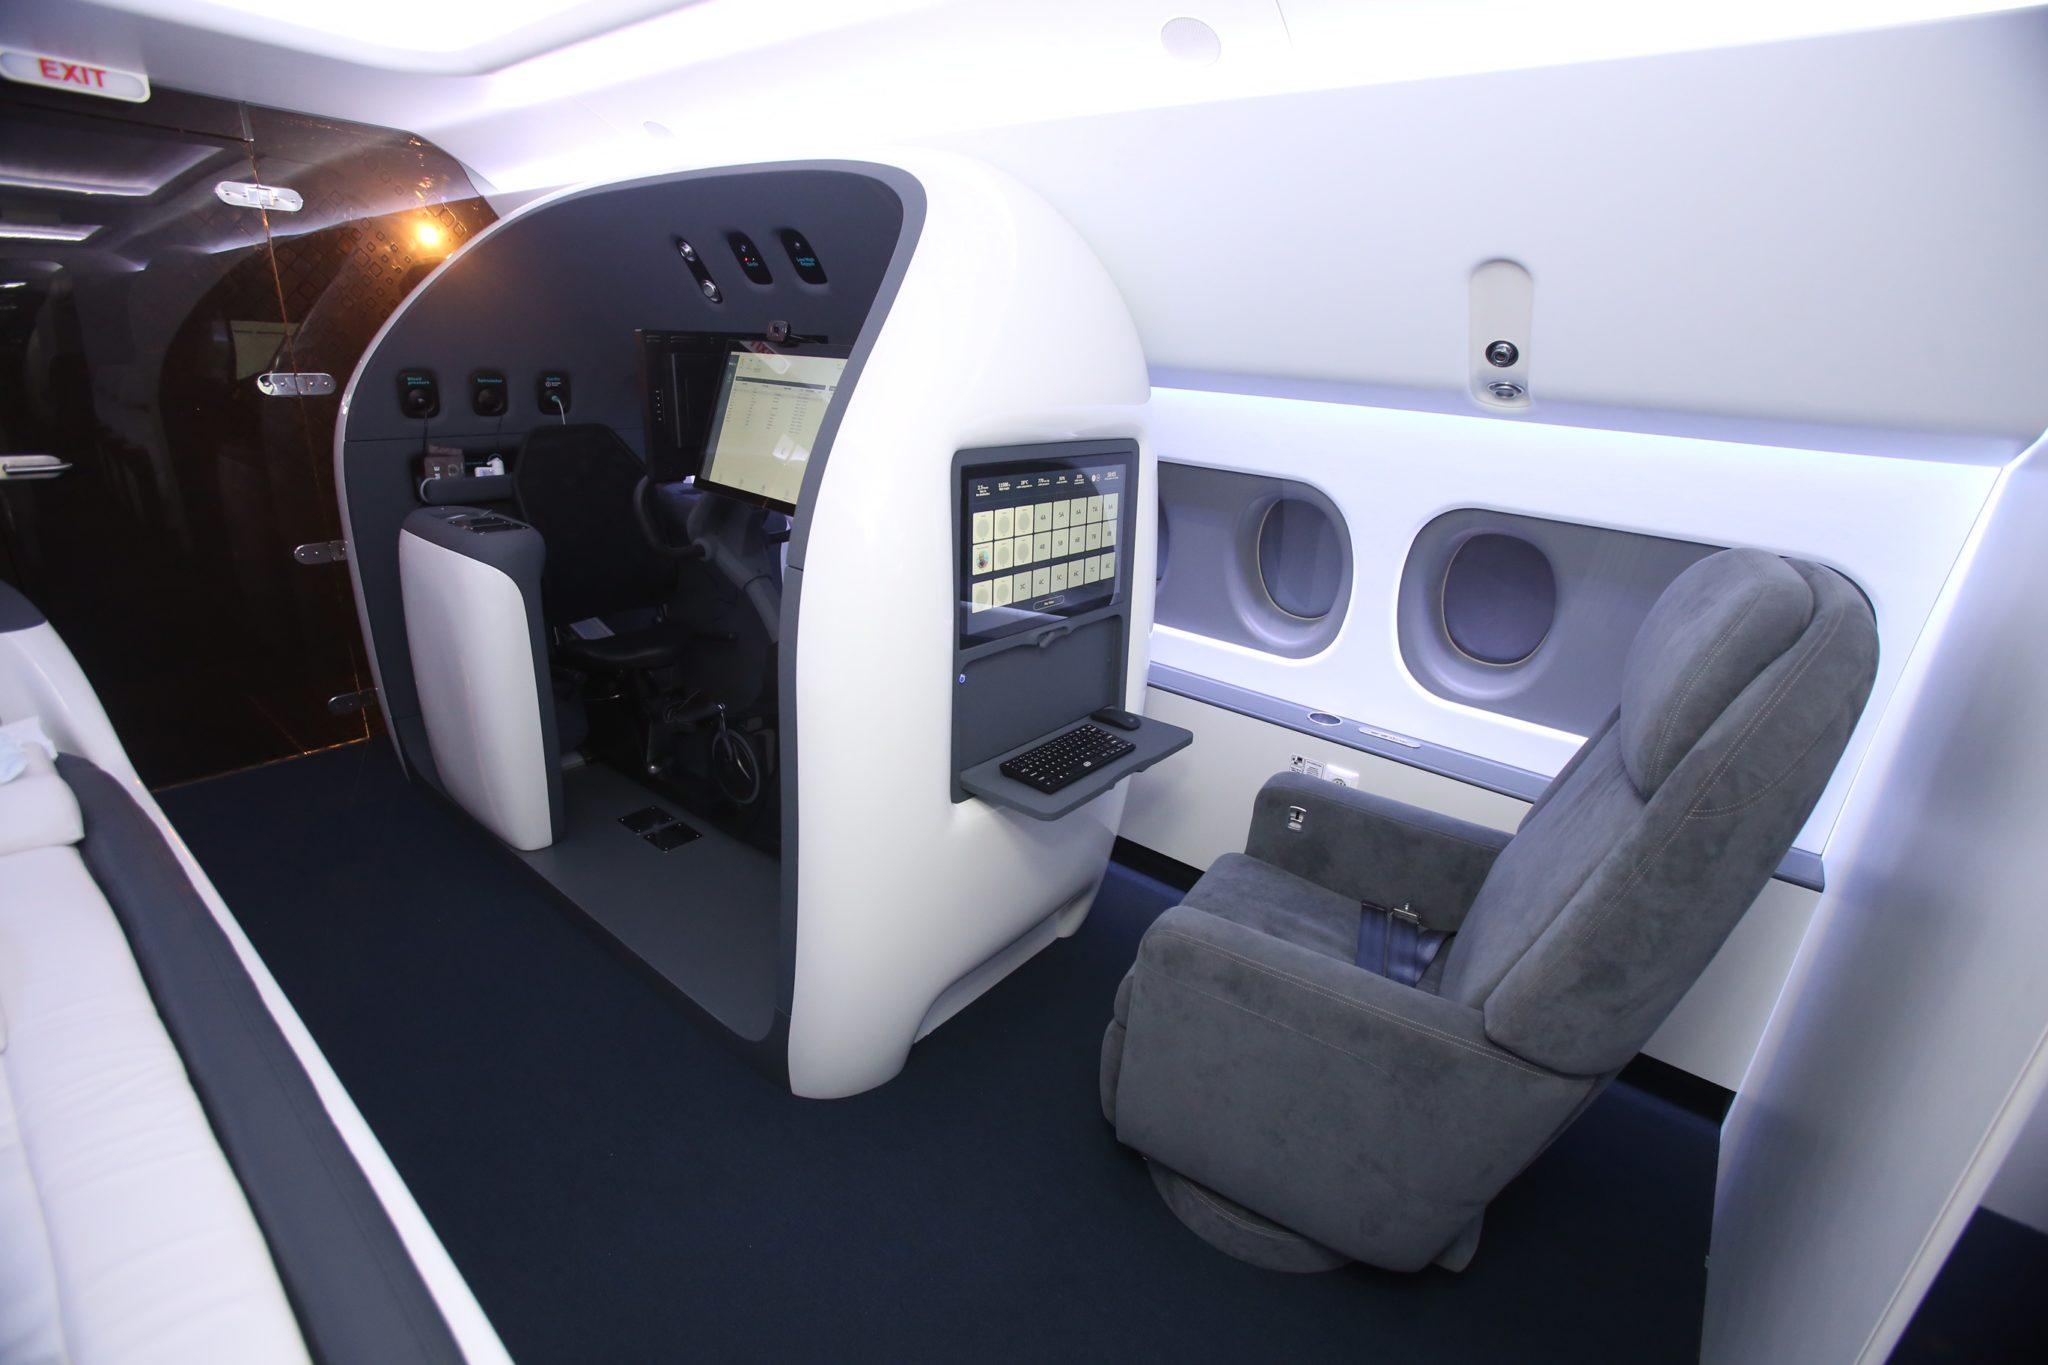 AeroScan chamber